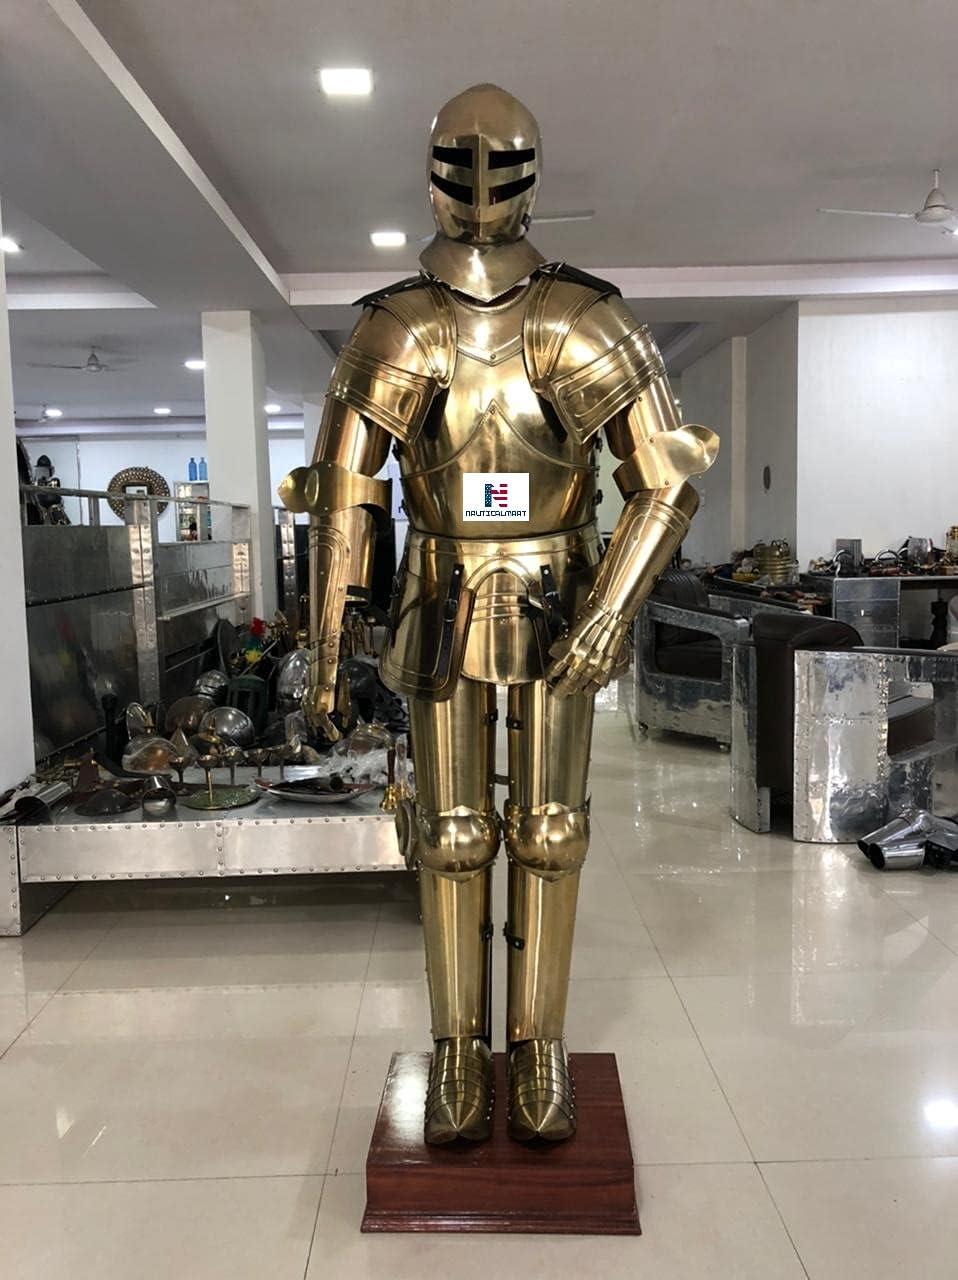 Nautical-Mart Brass Full Suit of Atlanta Max 71% OFF Mall Knight Armor LARP Hallowe